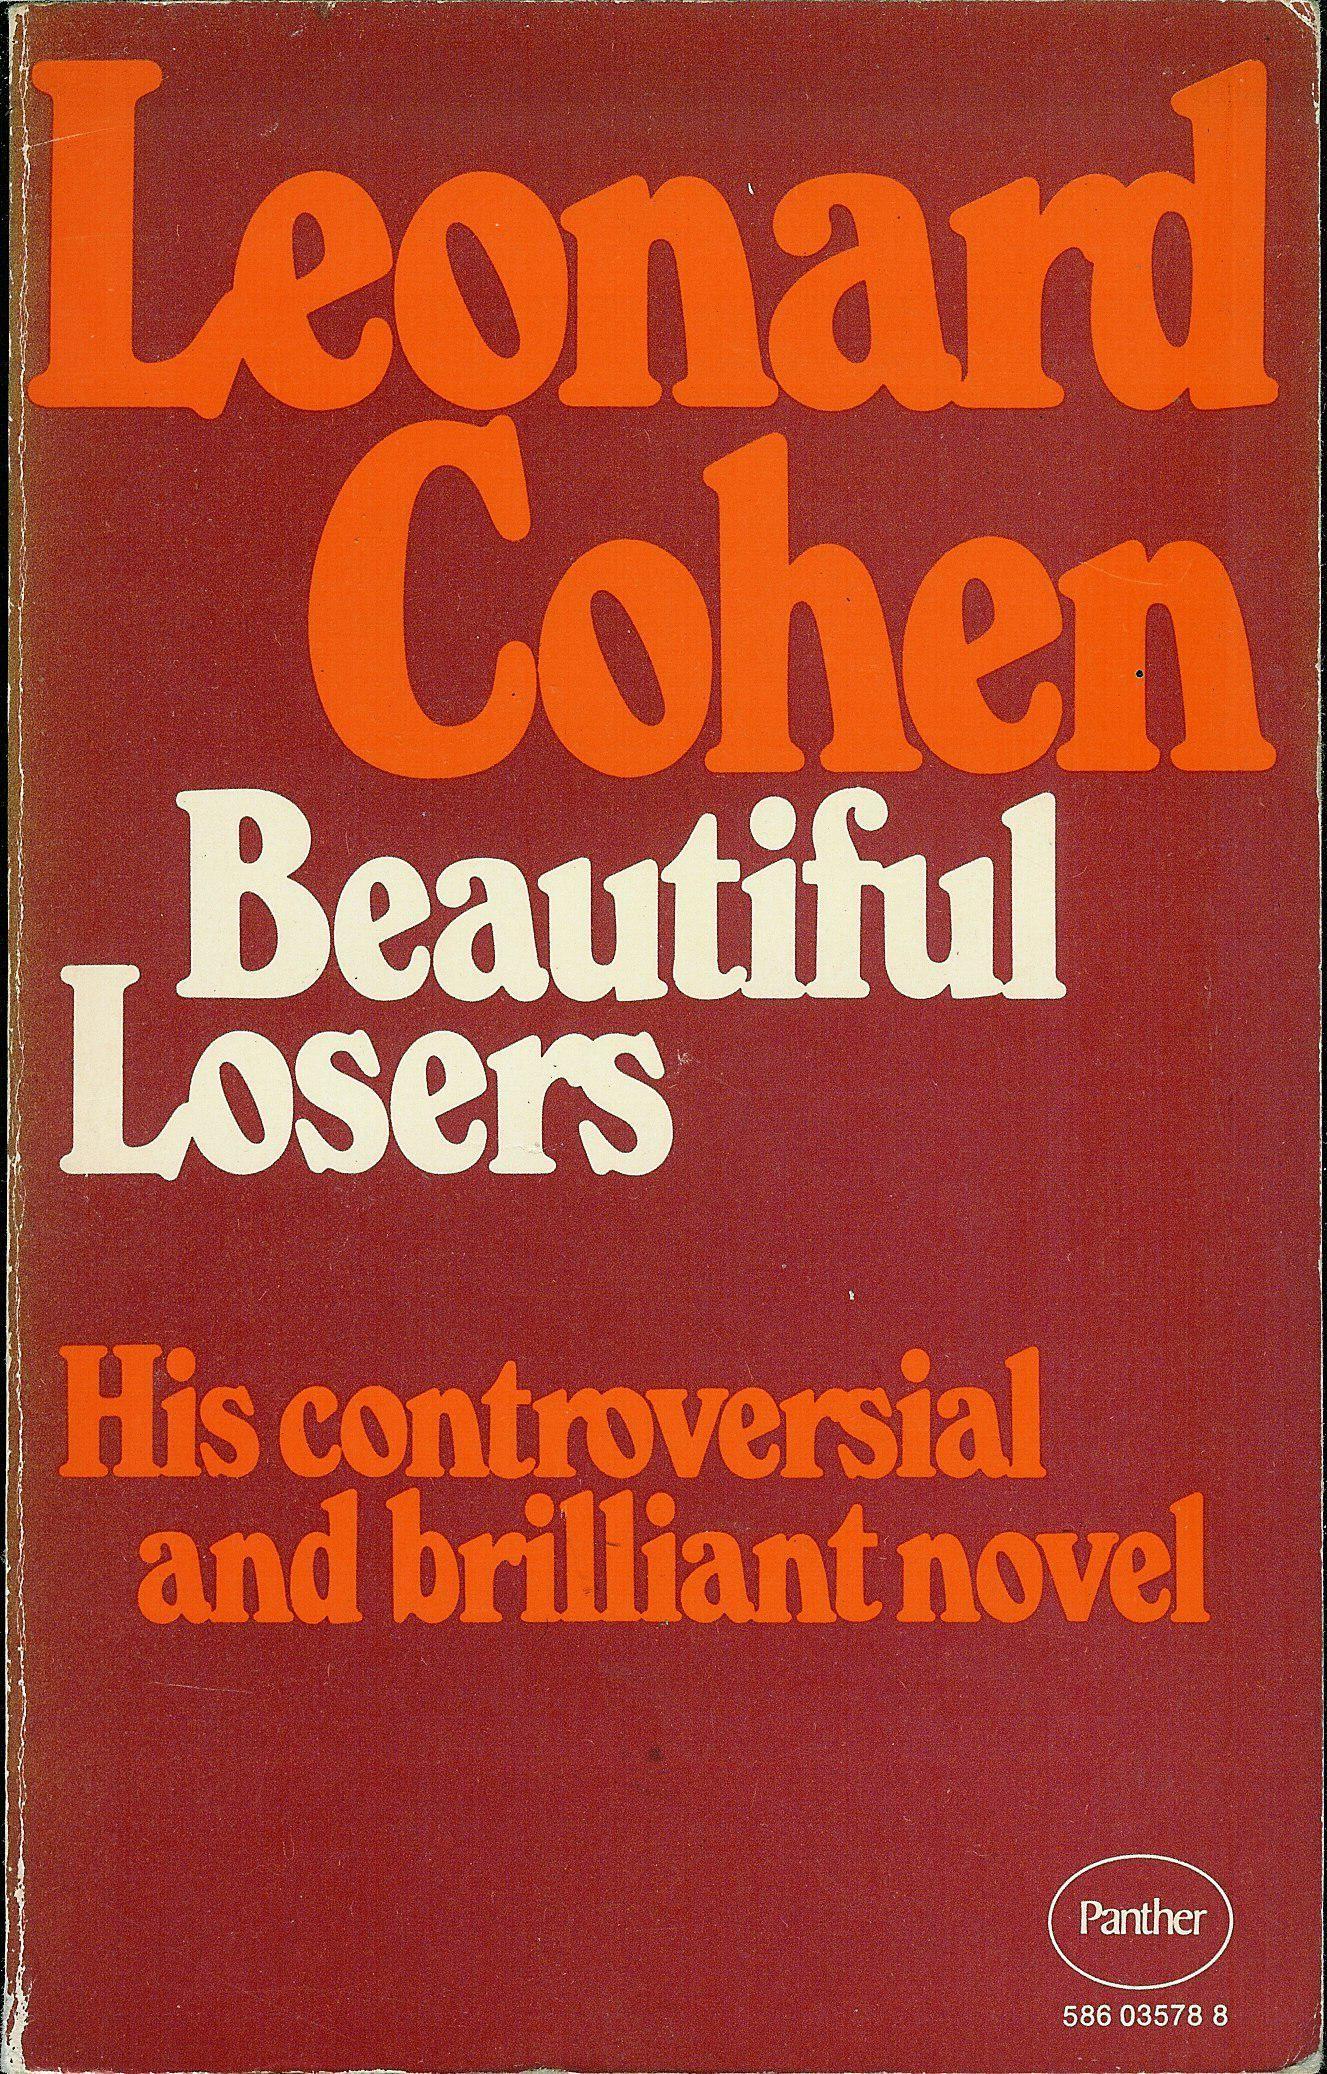 Ebook cohen losers beautiful leonard